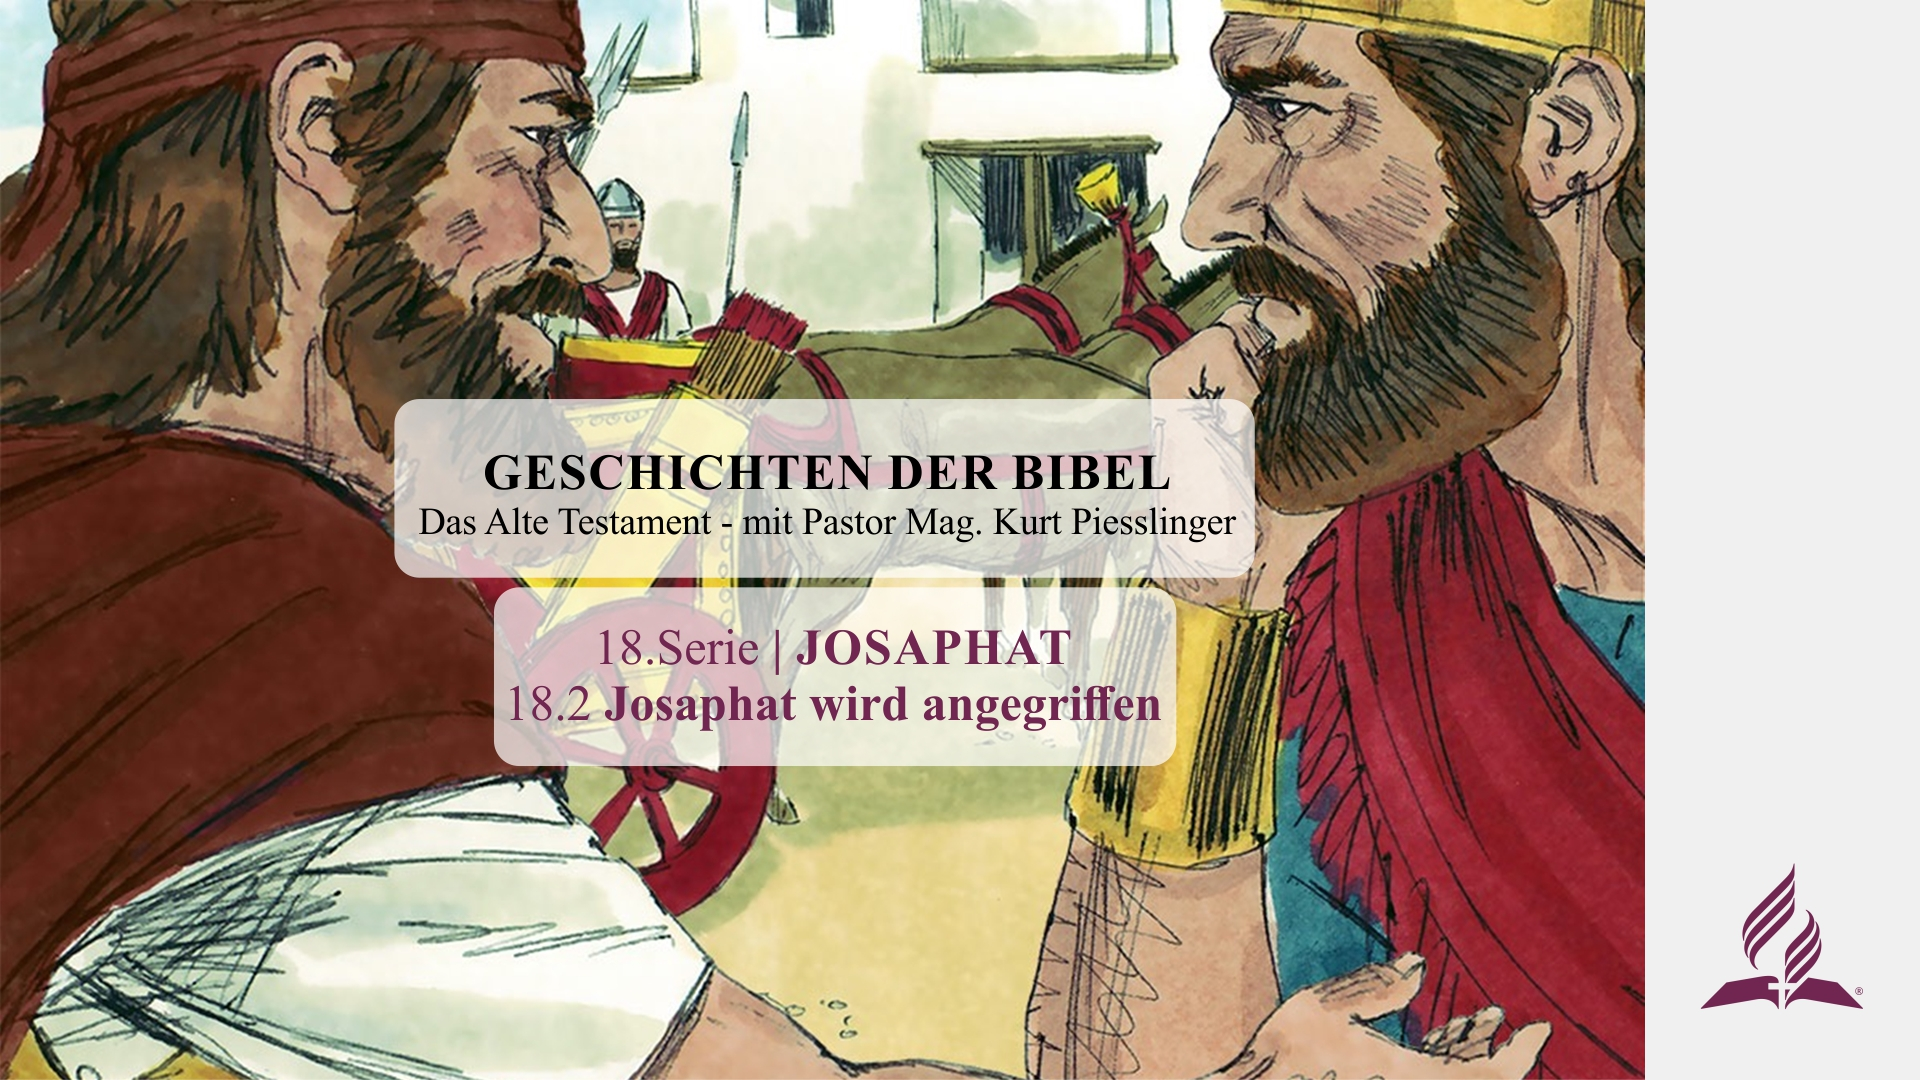 GESCHICHTEN DER BIBEL : 18.2 Josaphat wird angegriffen – 18.JOSAPHAT | Pastor Mag. Kurt Piesslinger